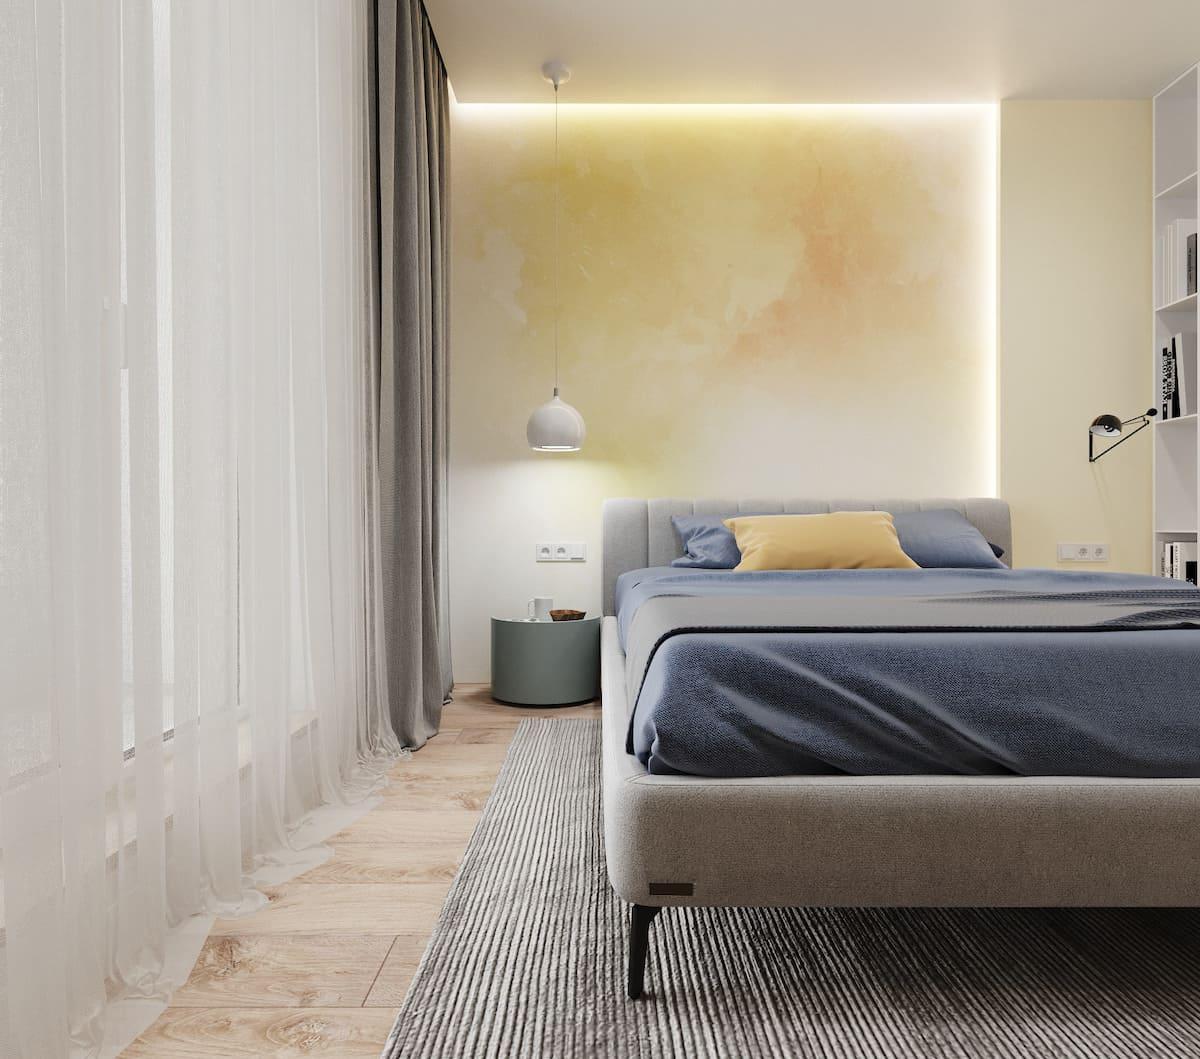 дизайн интерьера модной квартиры фото 91